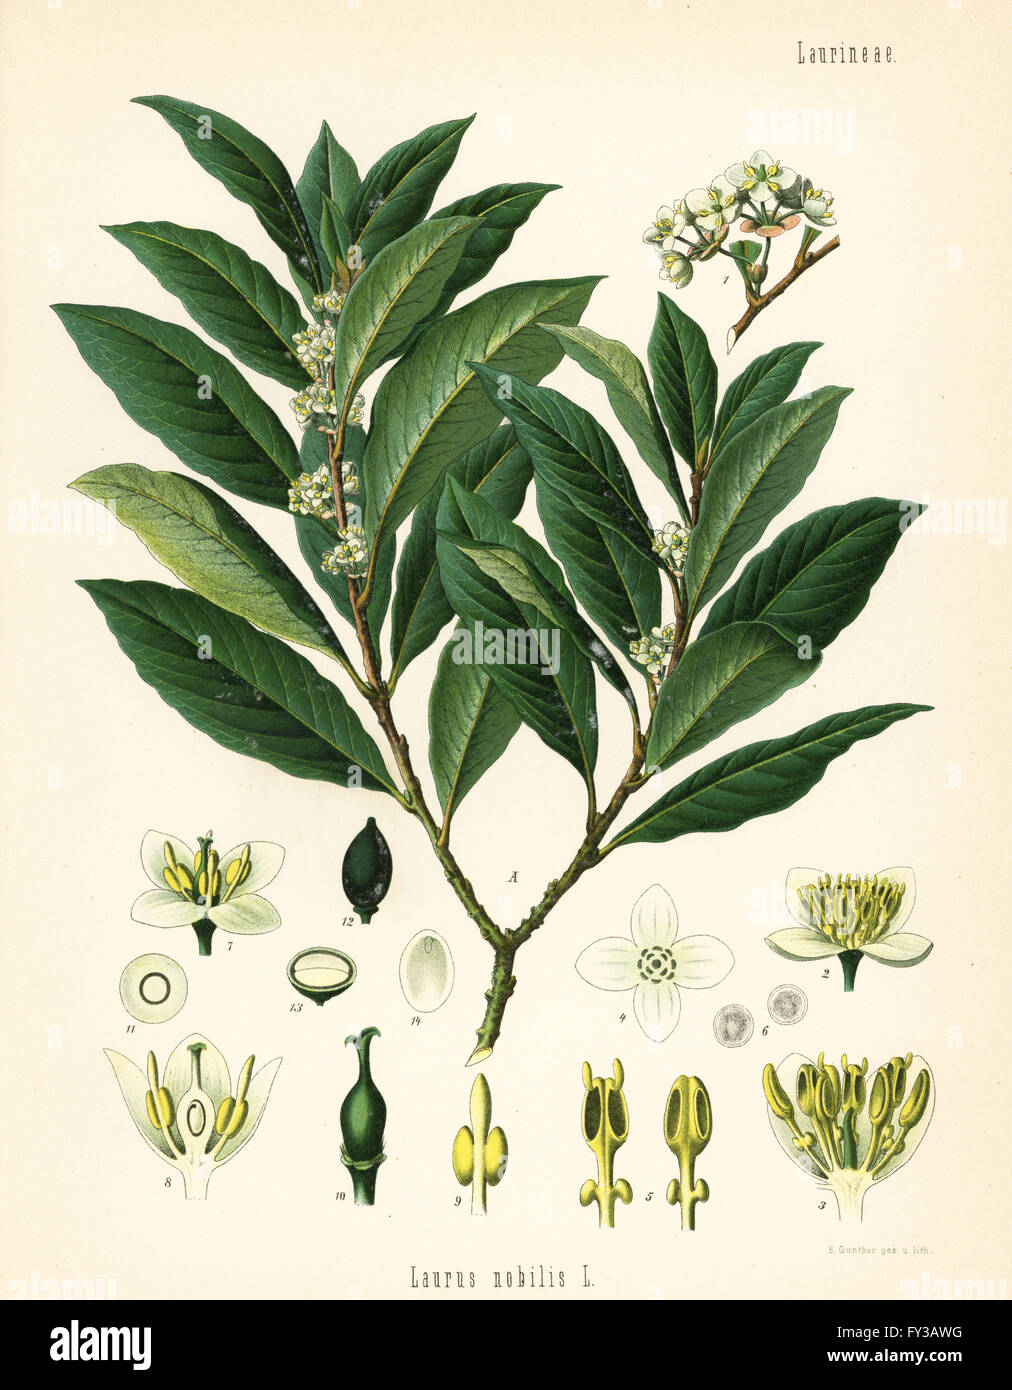 bay laurel or sweet bay tree laurus nobilis. Black Bedroom Furniture Sets. Home Design Ideas